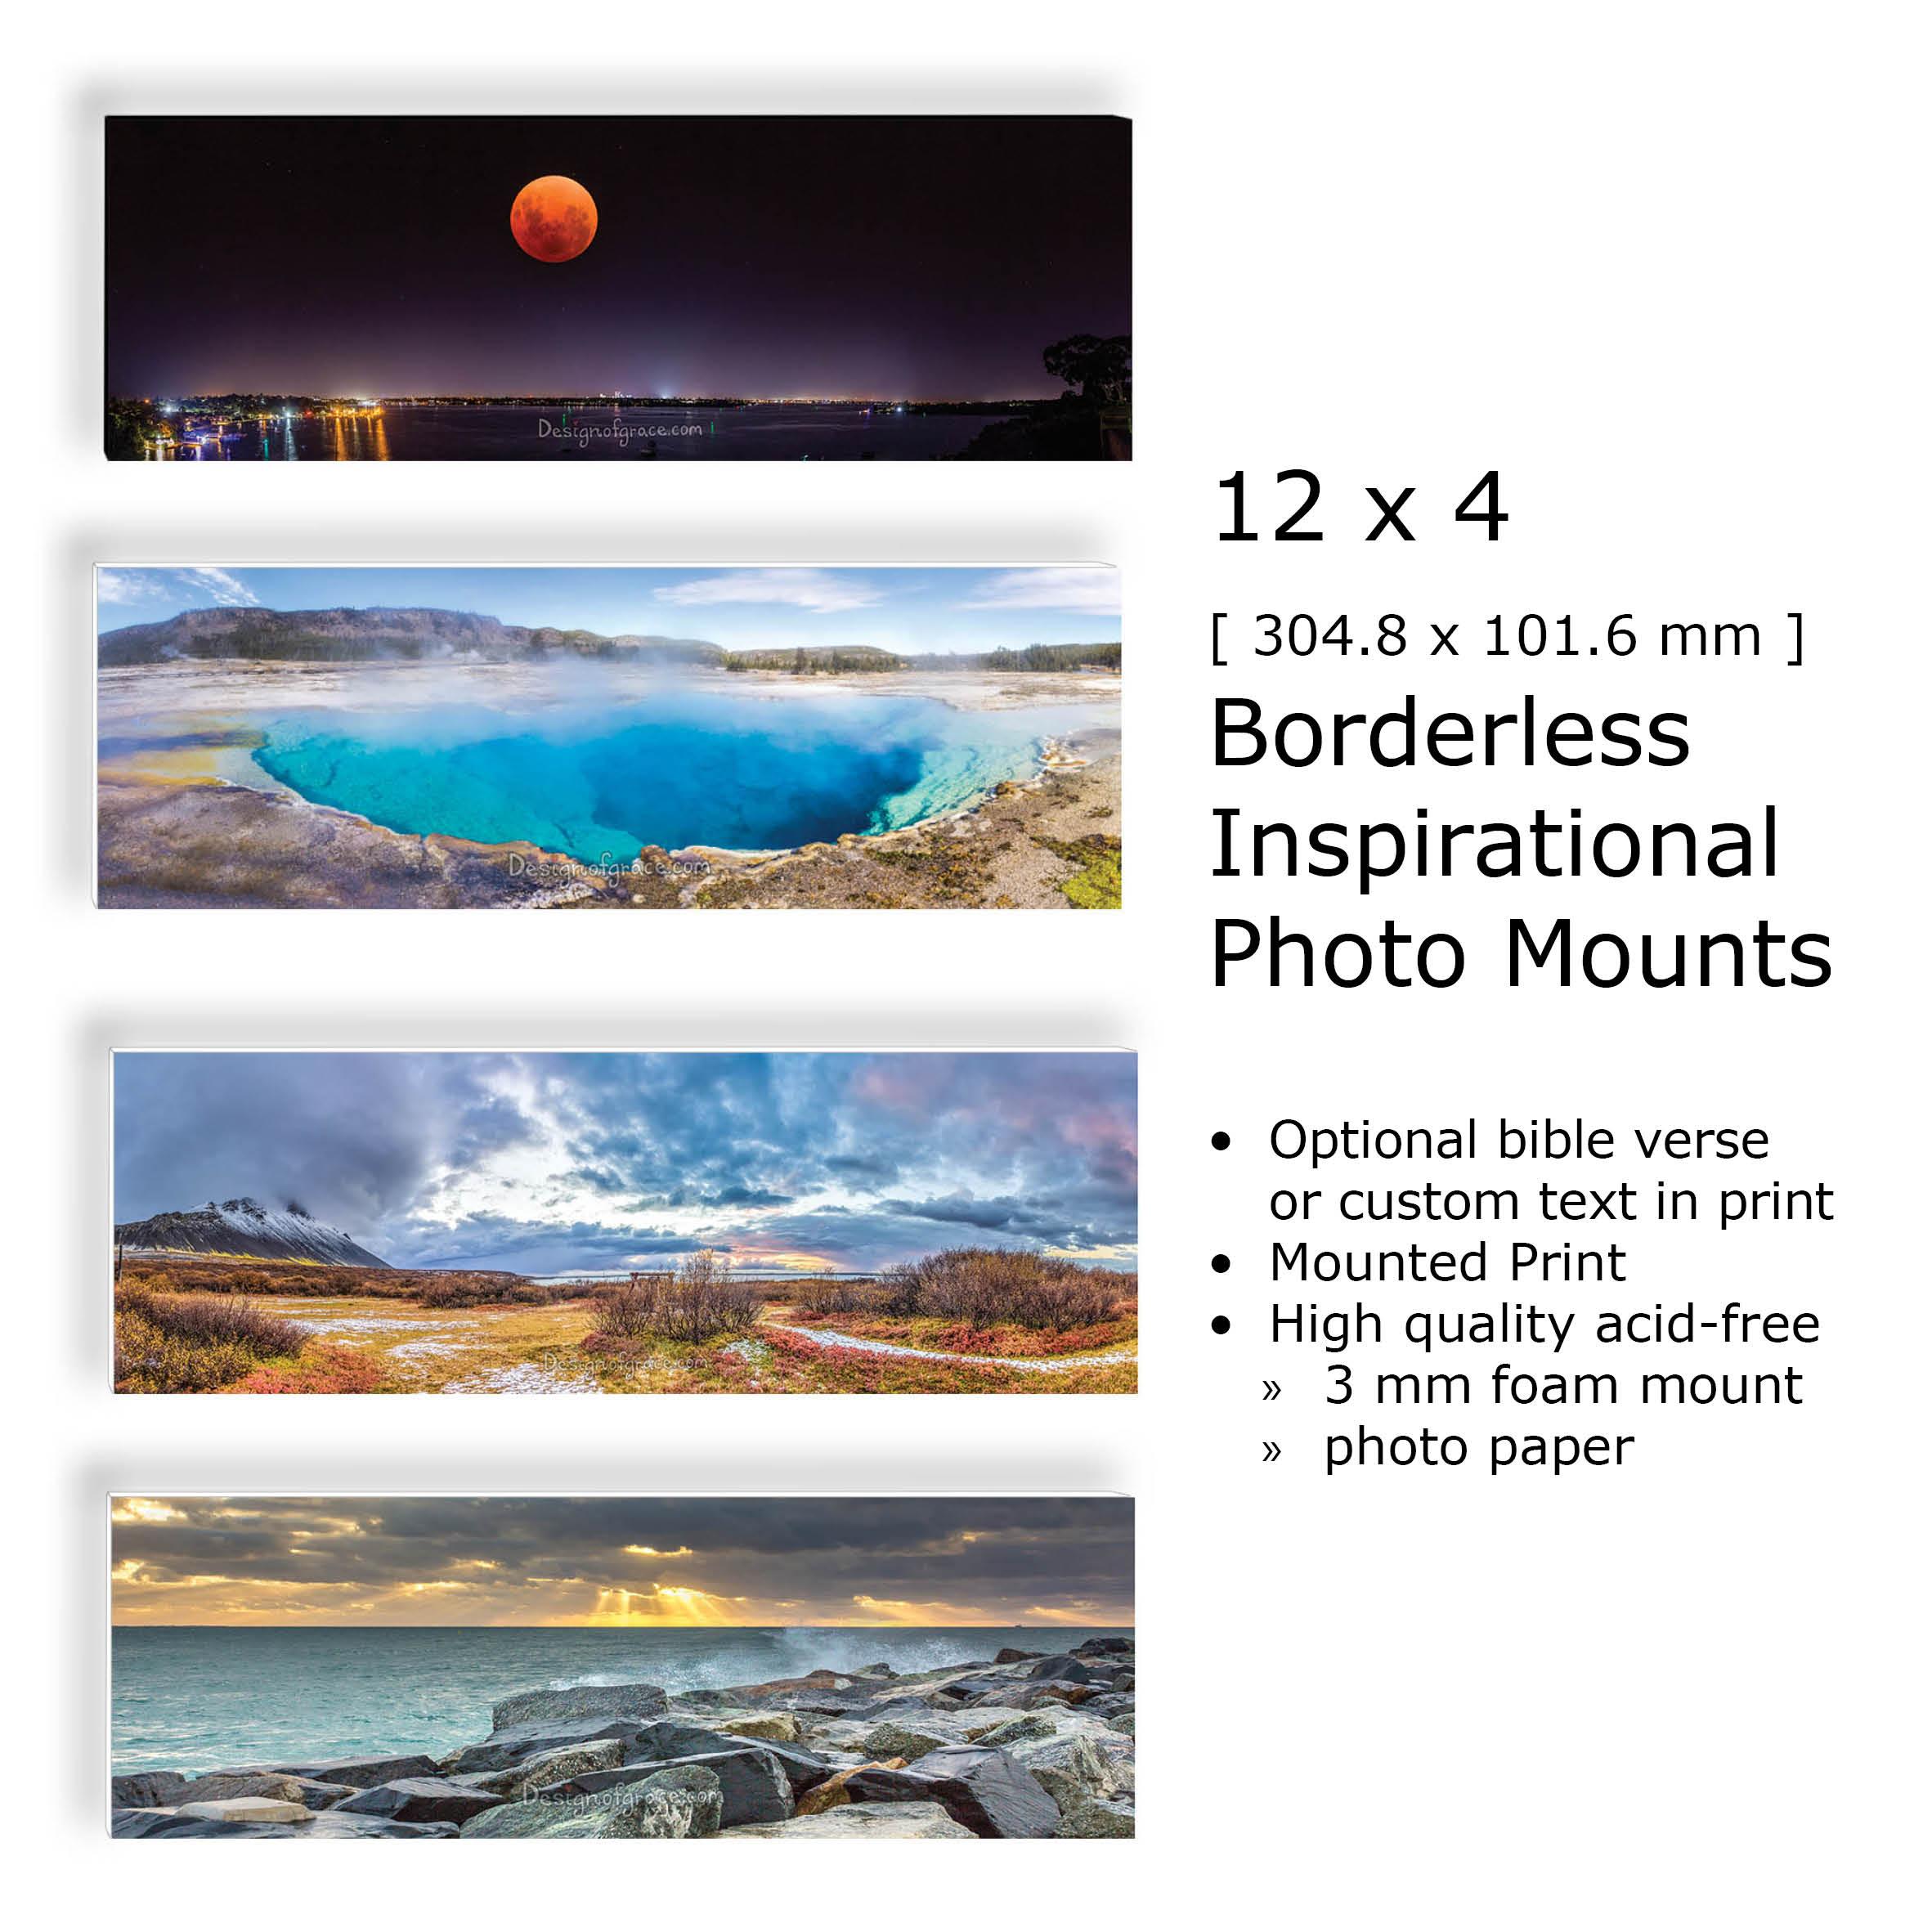 12x4_inspirational_mounts.jpg